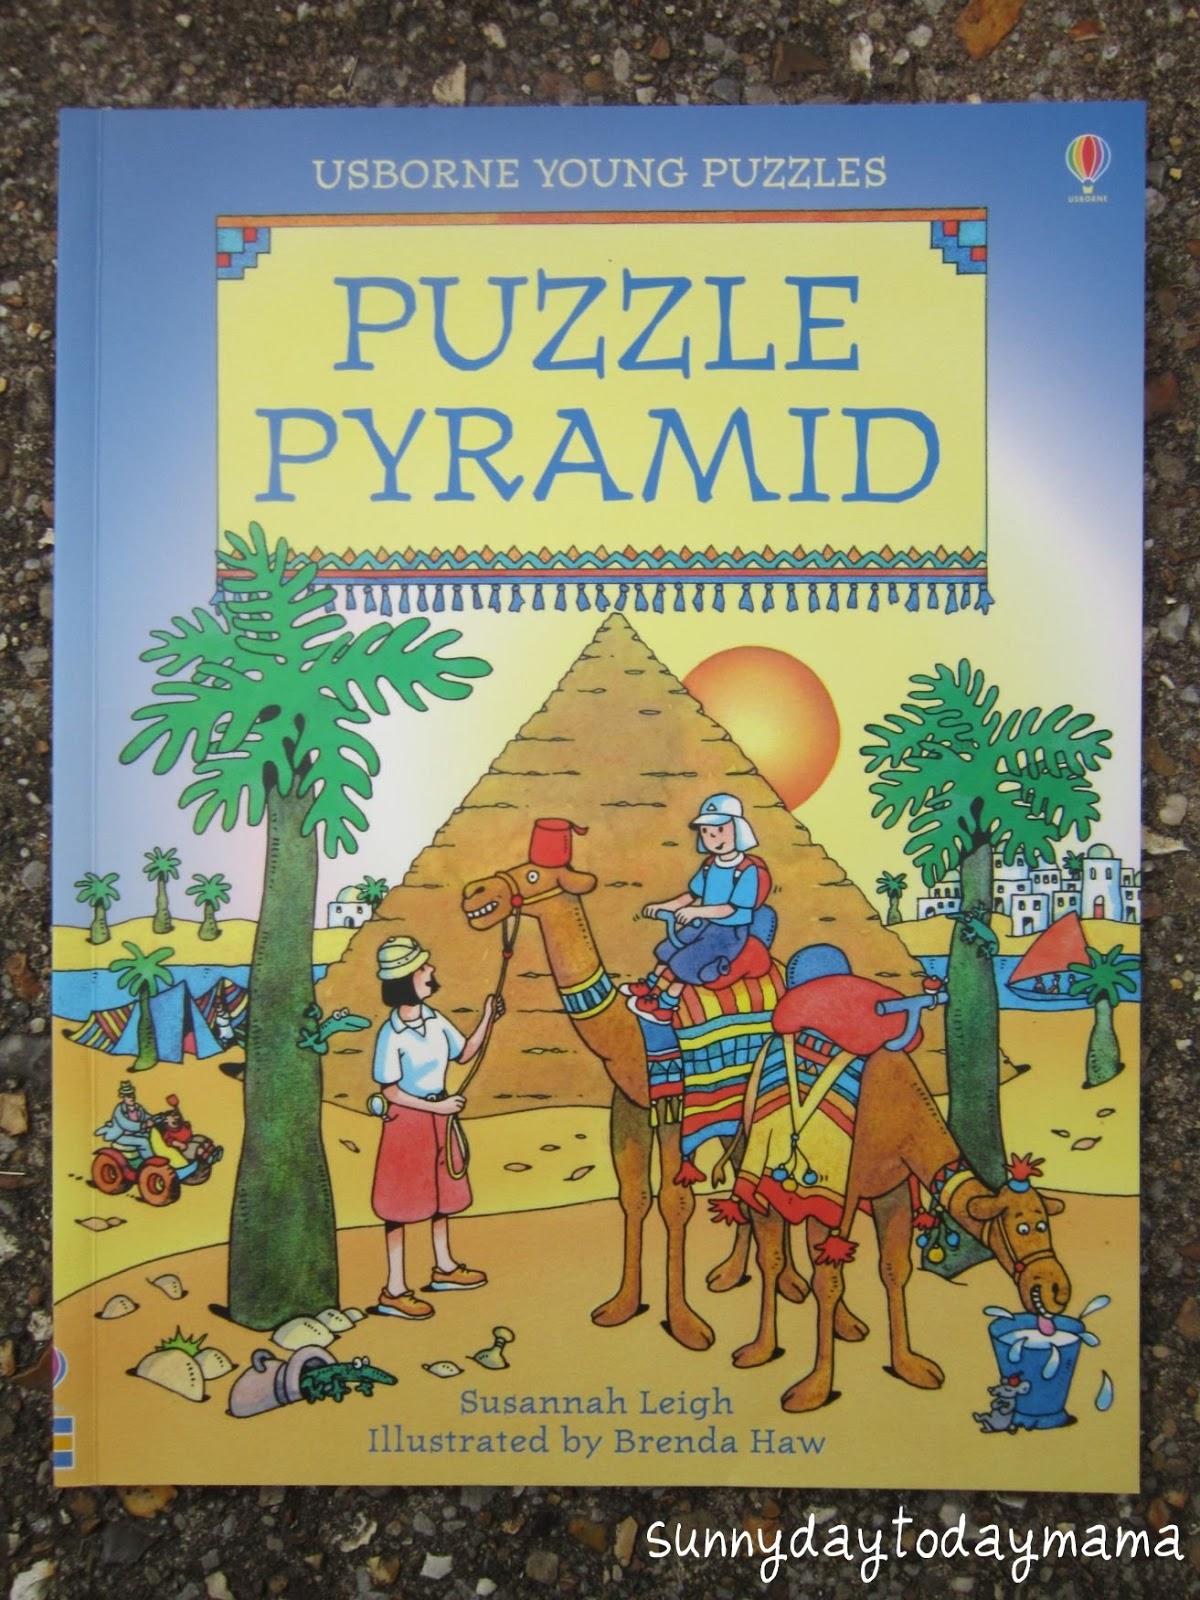 Sunnydaytodaymama 15 Books About Egypt For Children